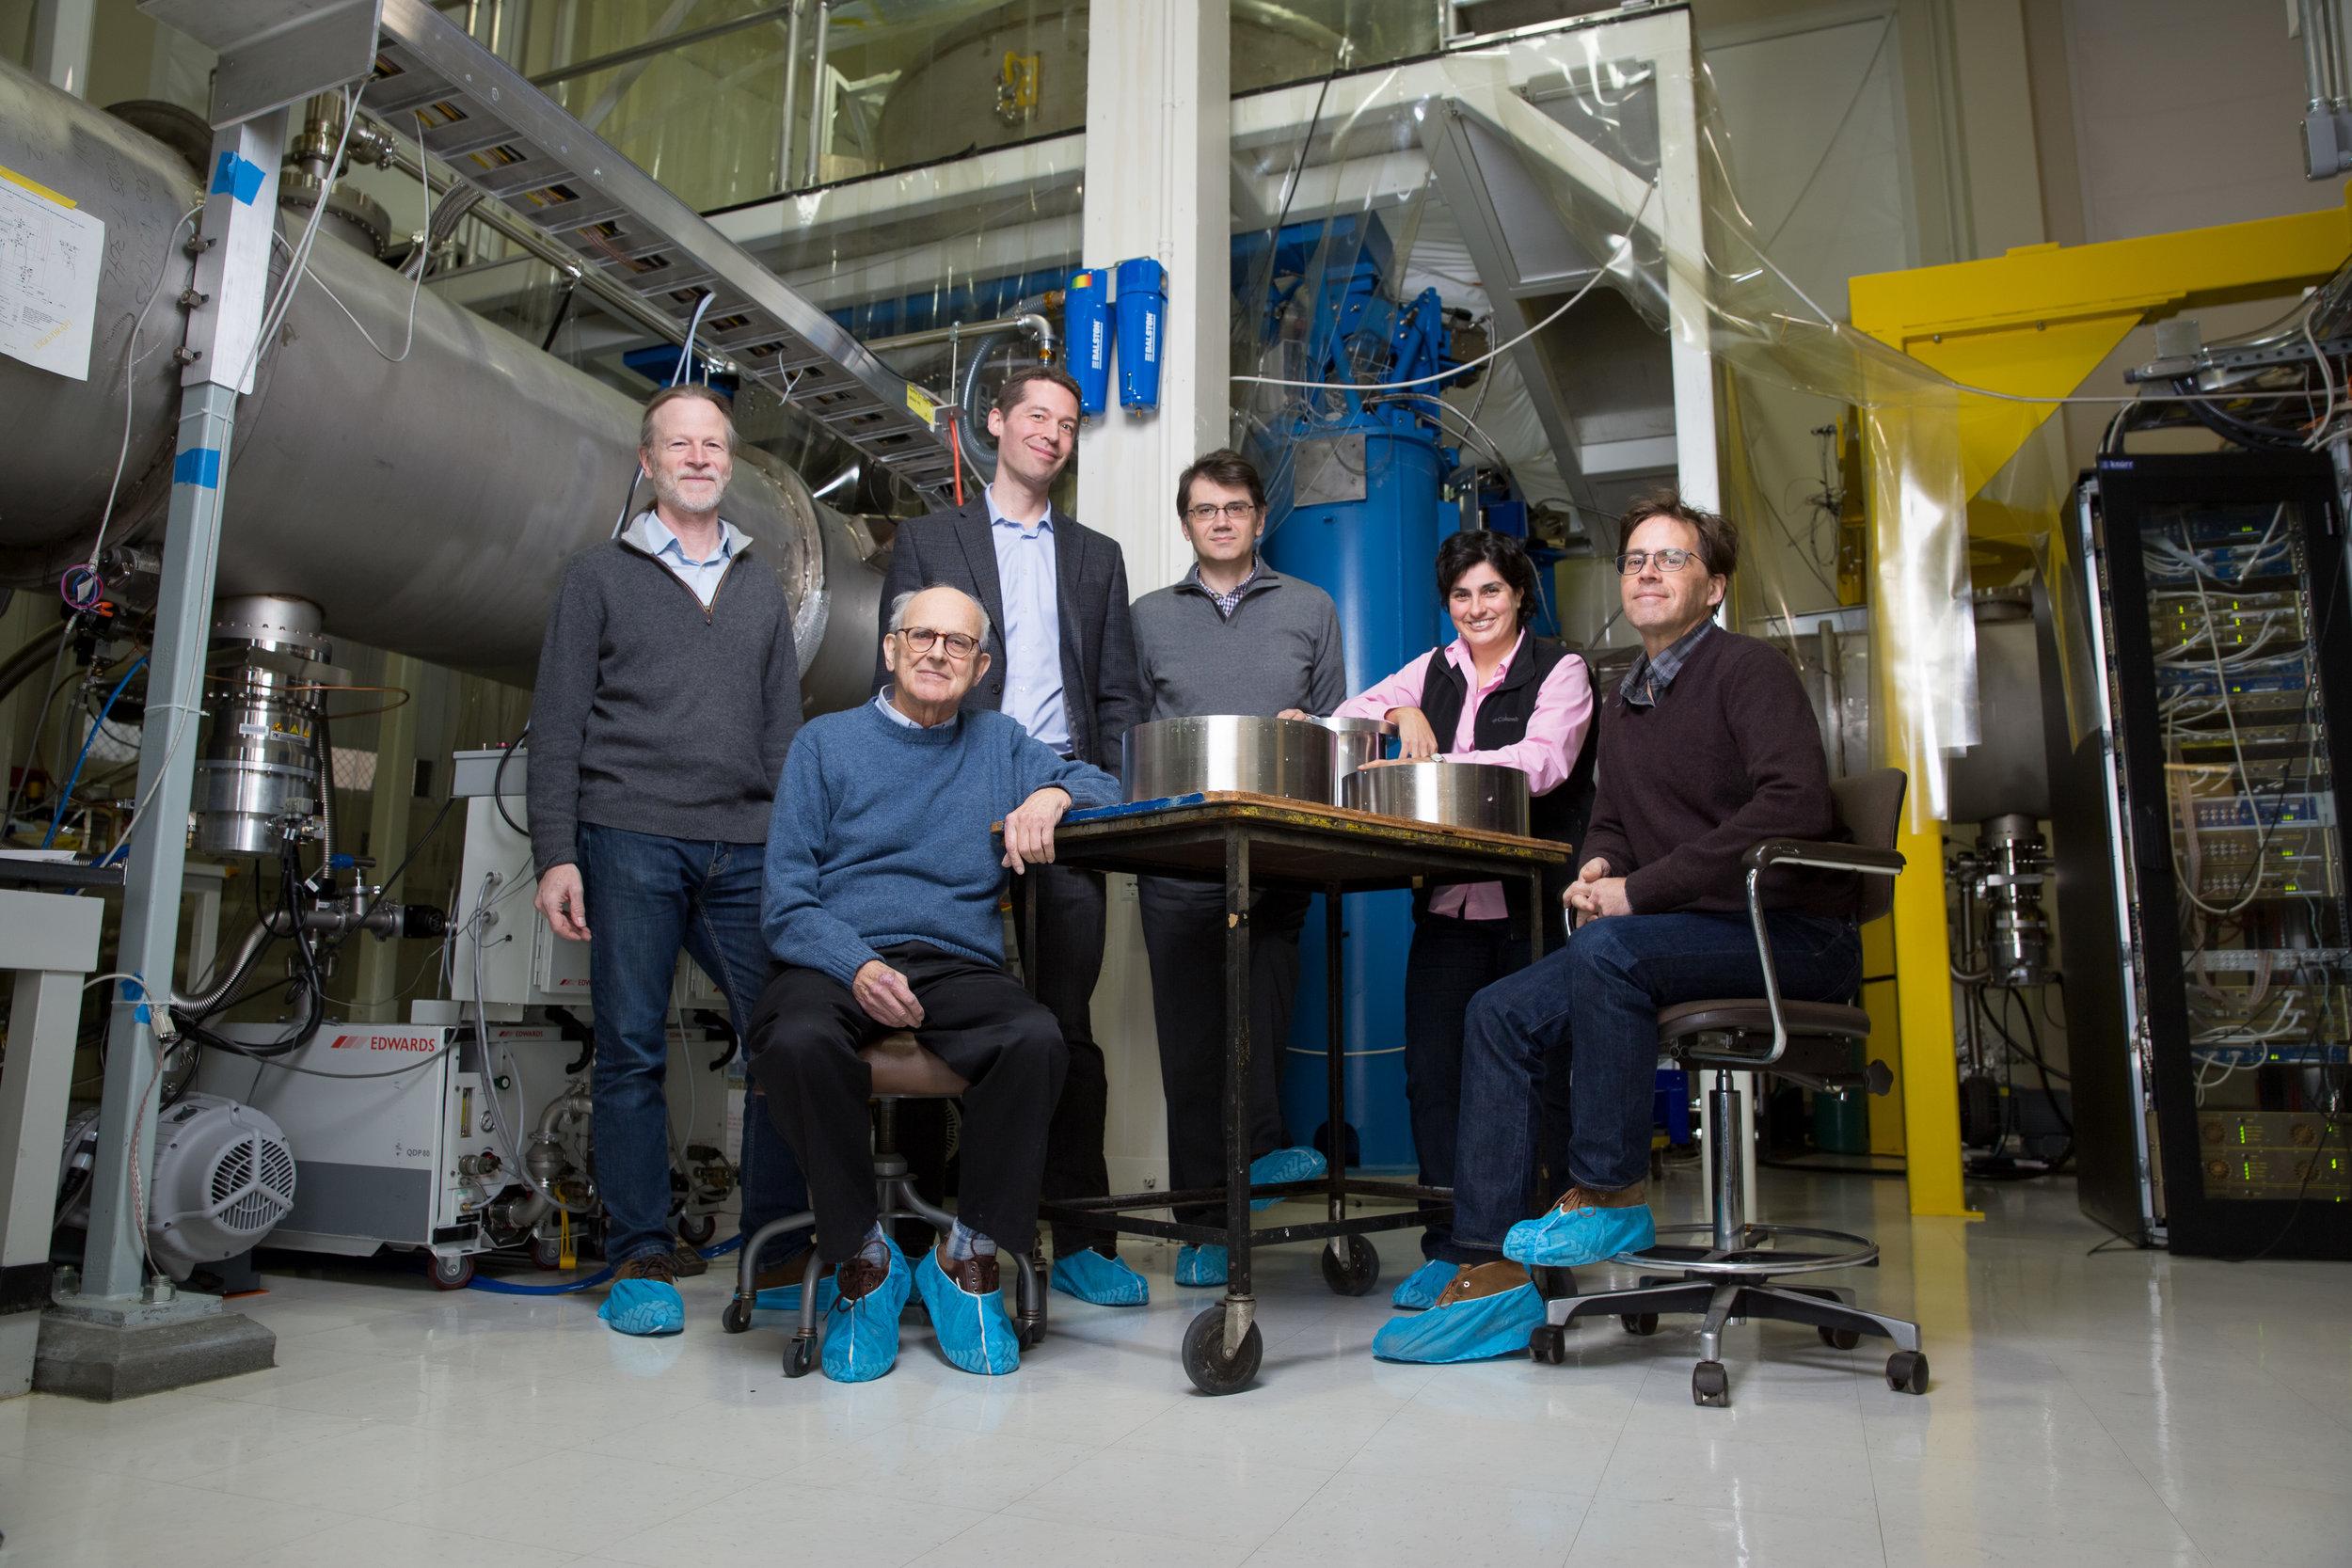 This photograph shows the LIGO research team. (Left to right) David Shoemaker, Rainer Weiss, Matthew Evans, Erotokritos Katsavounidis, Nergis Mavalvala, and Peter Fritschel. Photo: Bryce Vickmark